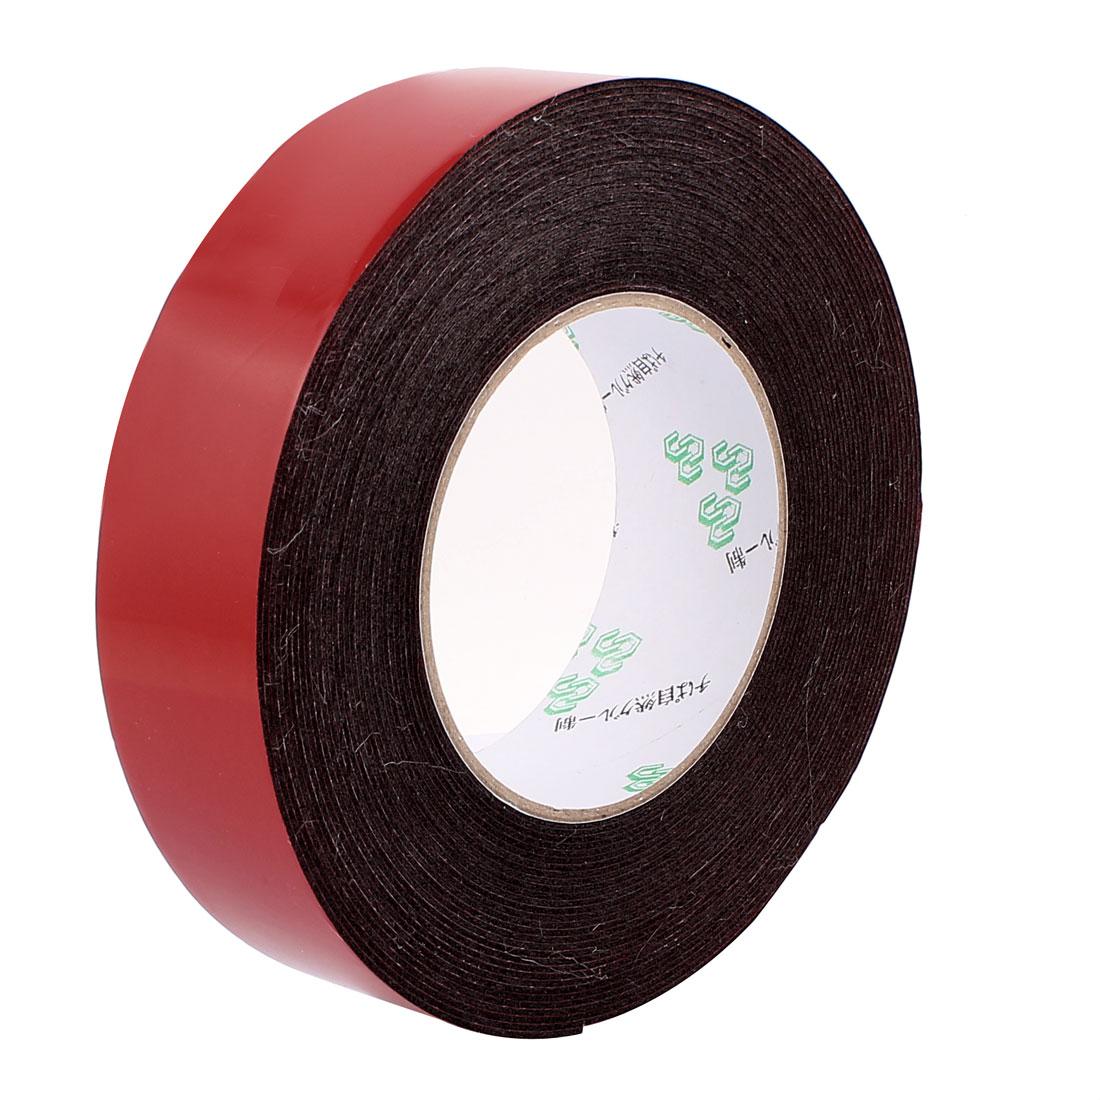 35mmx1mm Double Sided Sponge Tape Adhesive Sticker Foam Glue Strip Sealing 10 Meters 33Ft